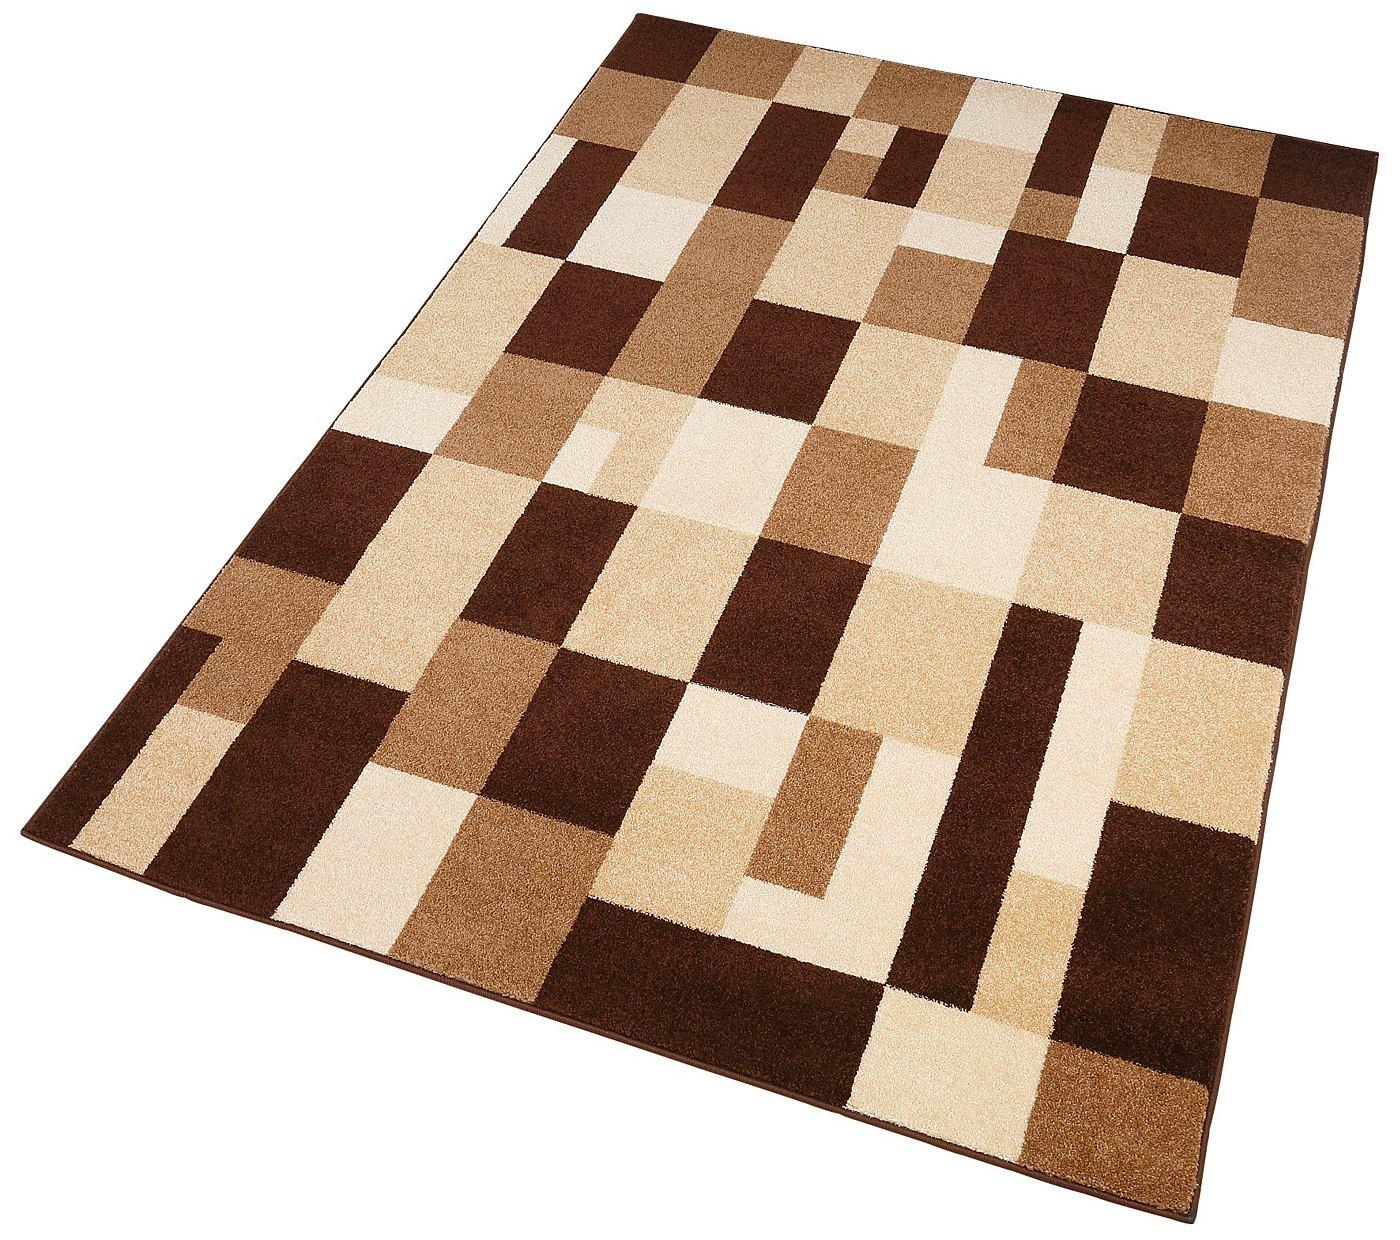 MY HOME Karpet Elias machinaal geweven